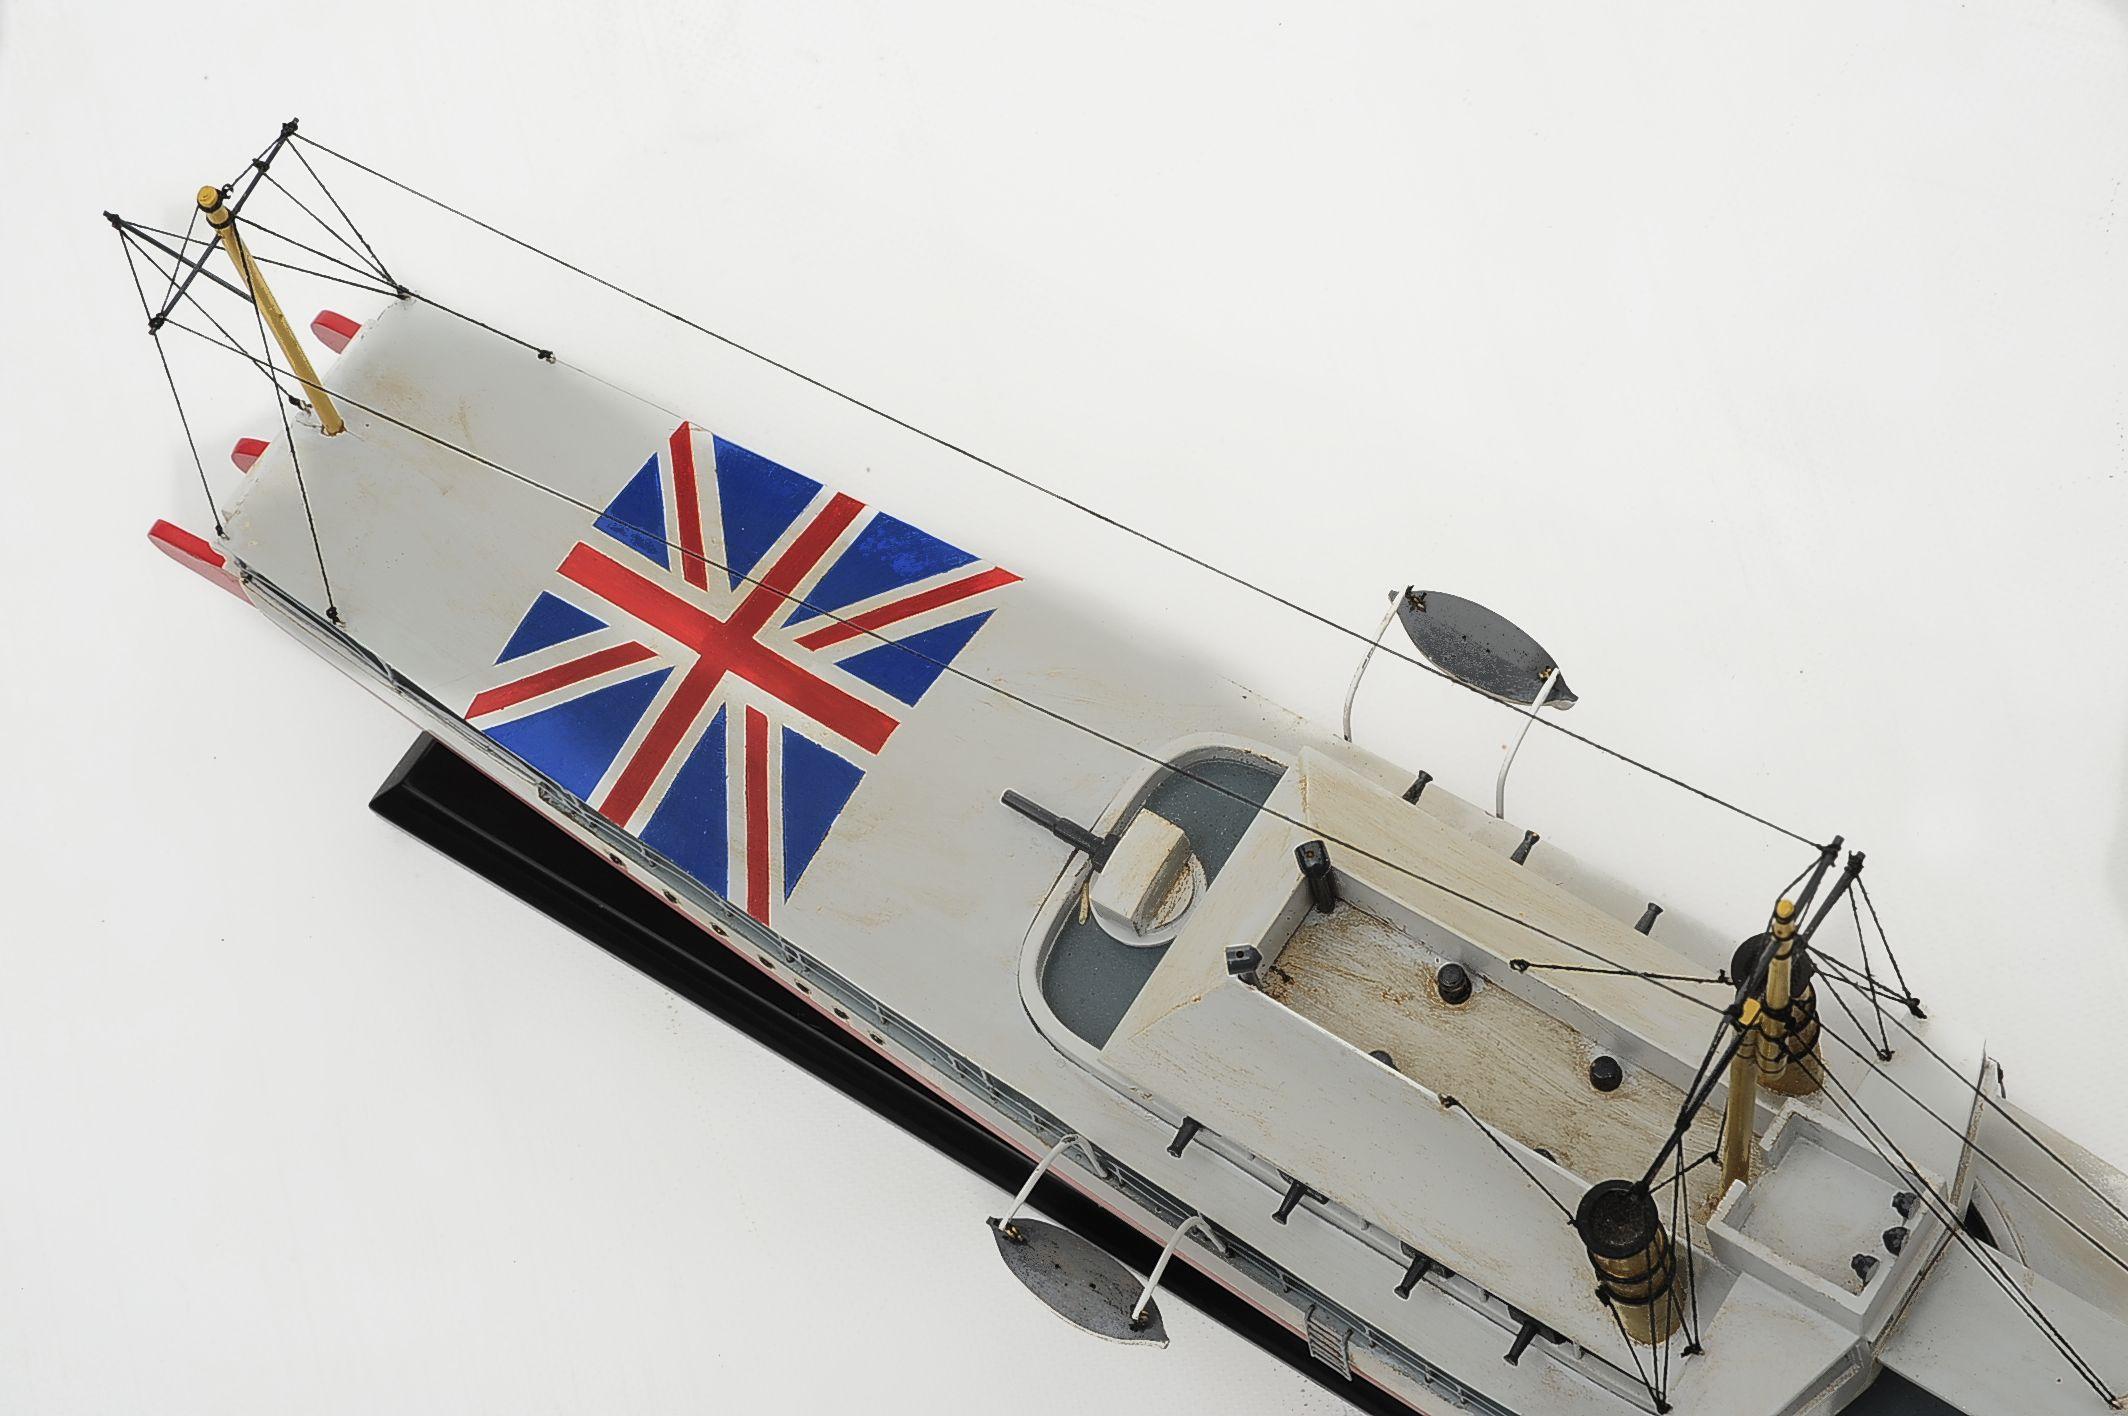 1392-6180-HMS-Cockchafer-Premier-Range